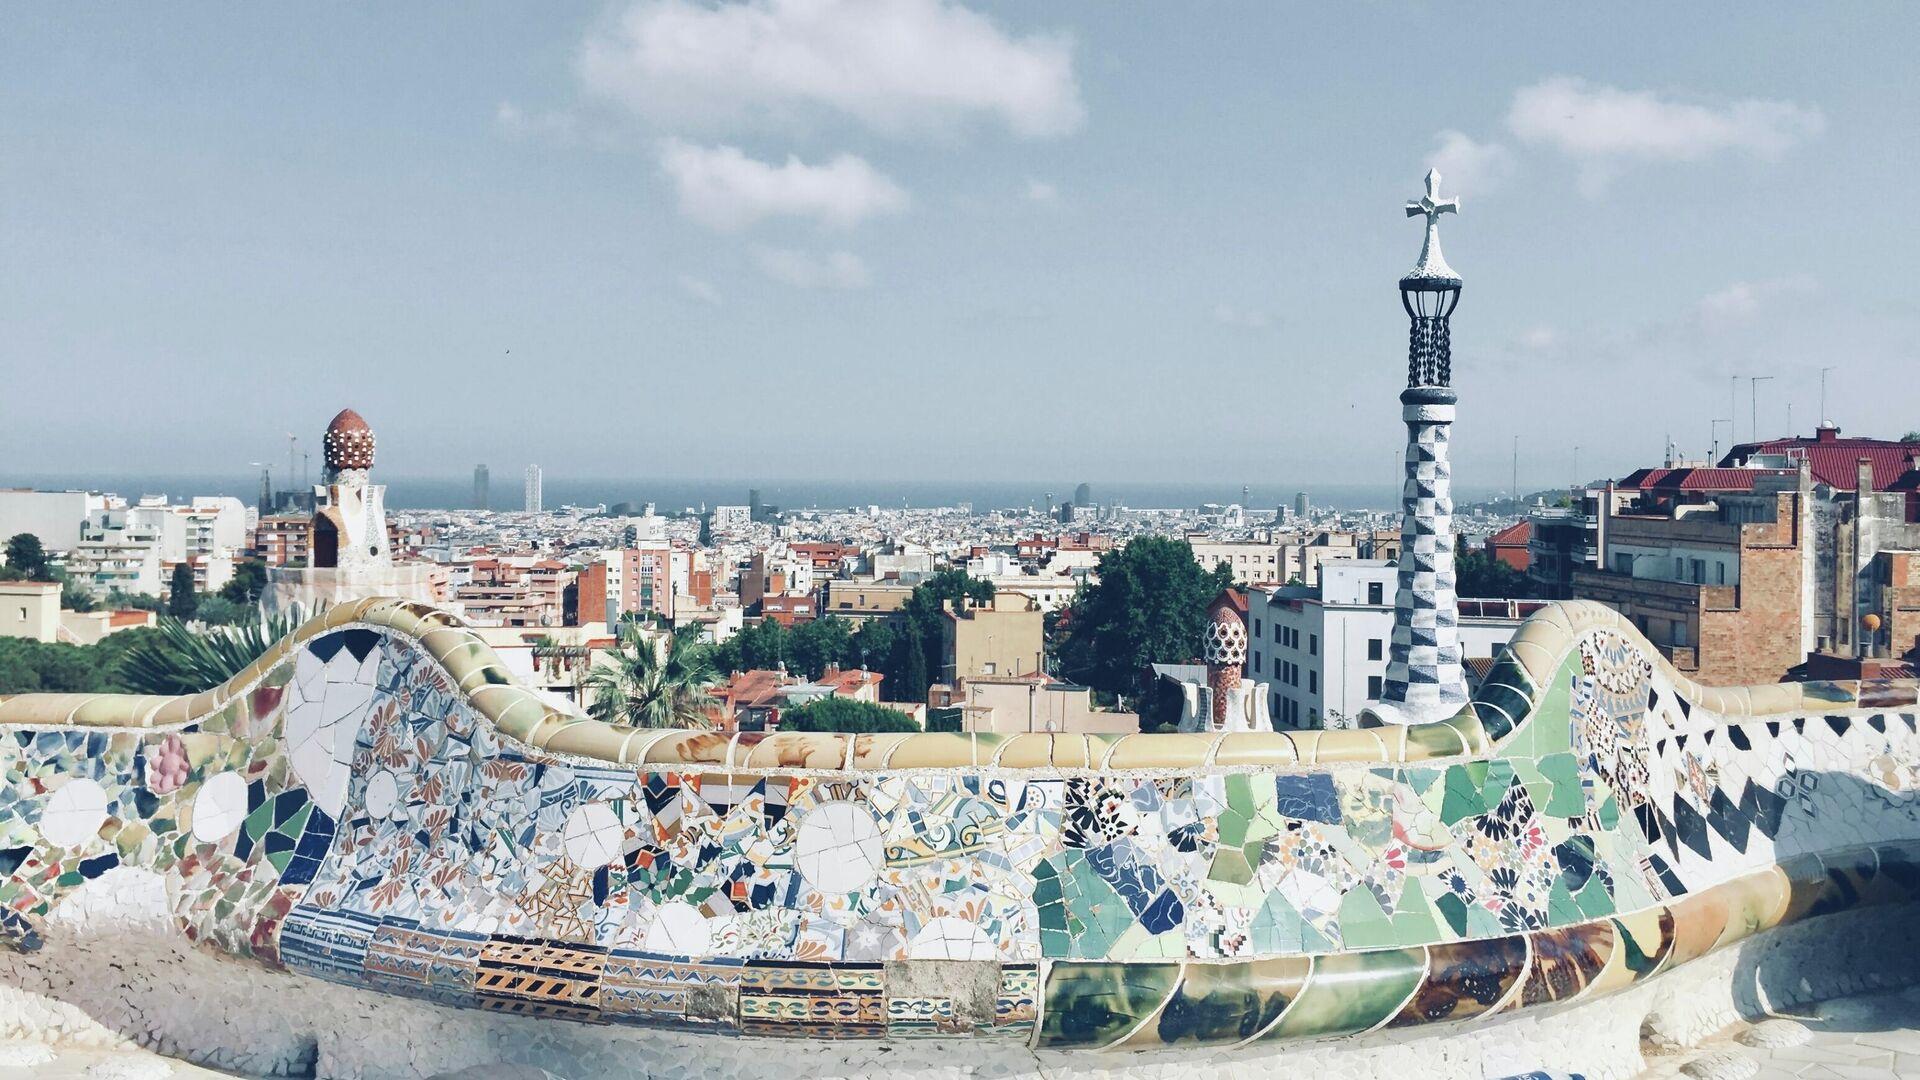 El parque Güell en Barcelona - Sputnik Mundo, 1920, 15.07.2021